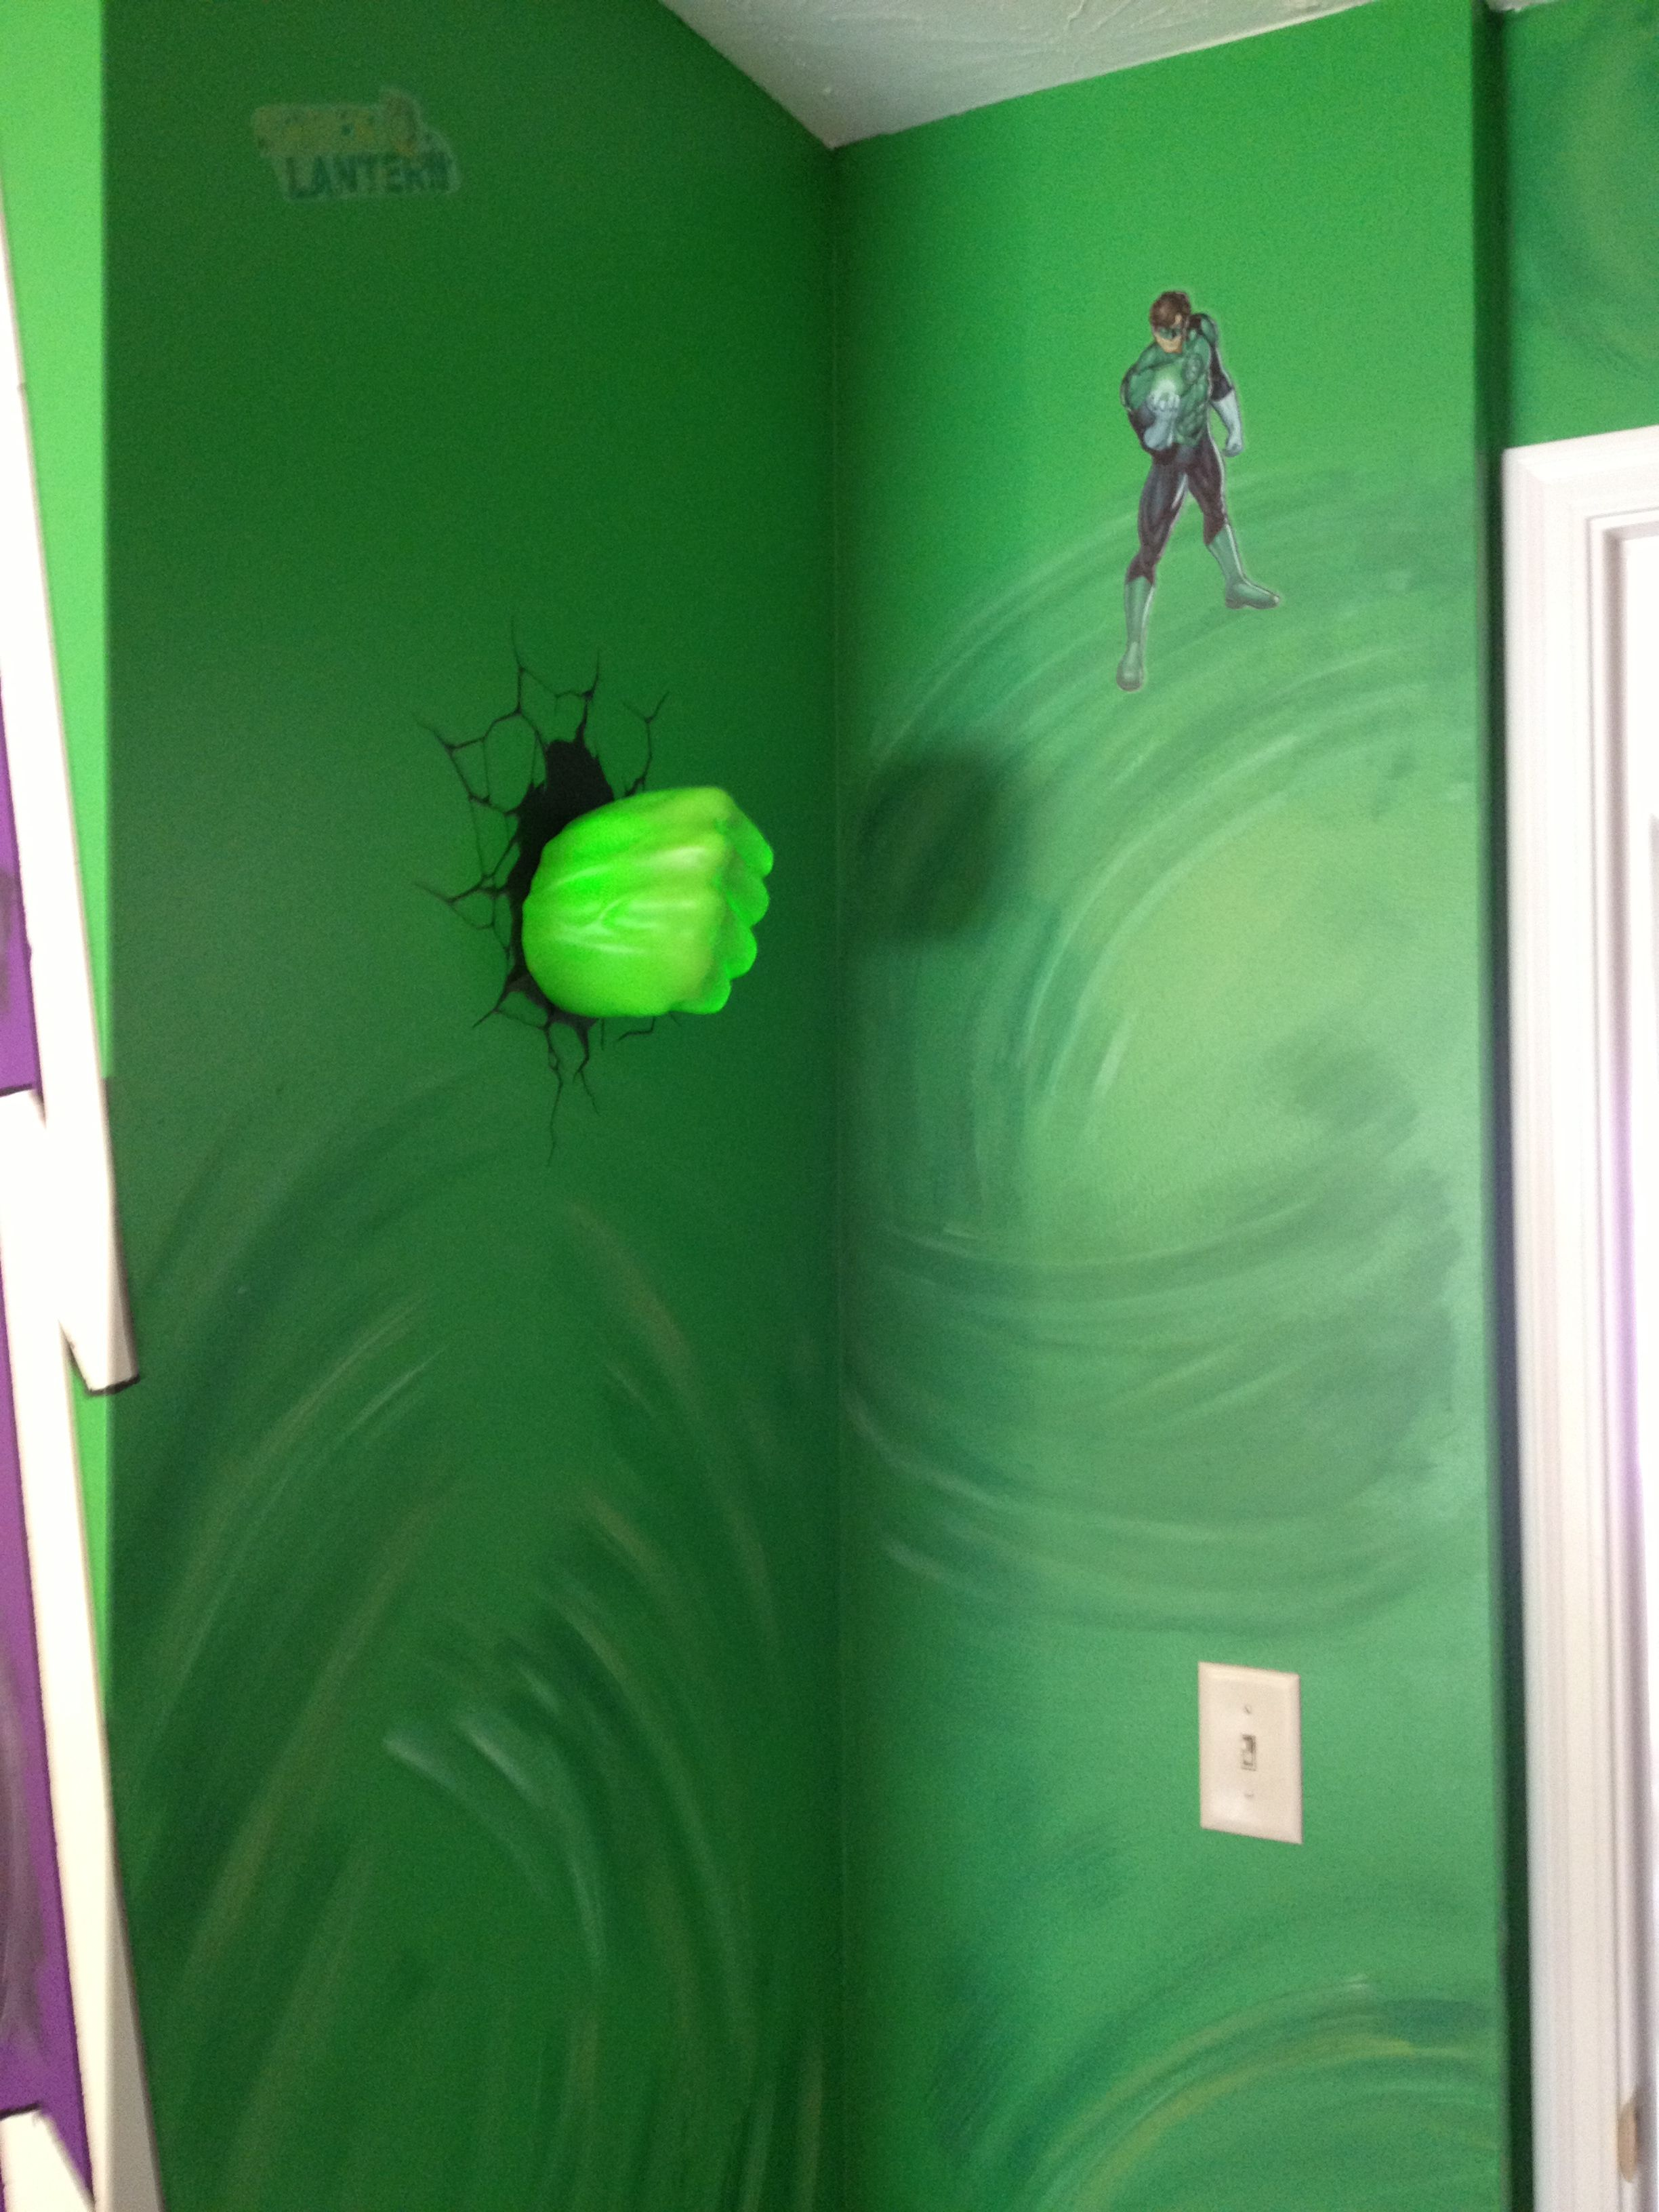 Hulk Hand Smashing Through Wall Just Inside Door It